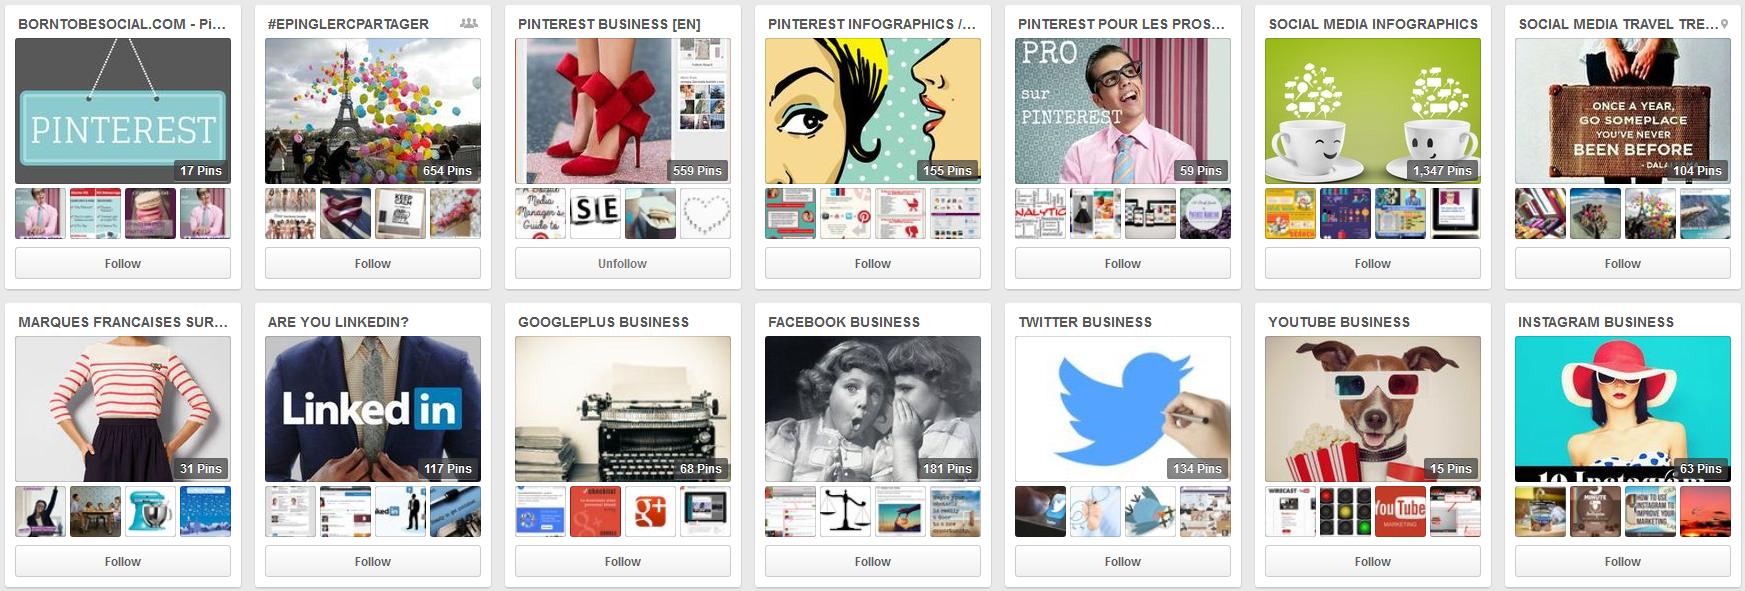 BornToBeSocial's boards on Pinterest